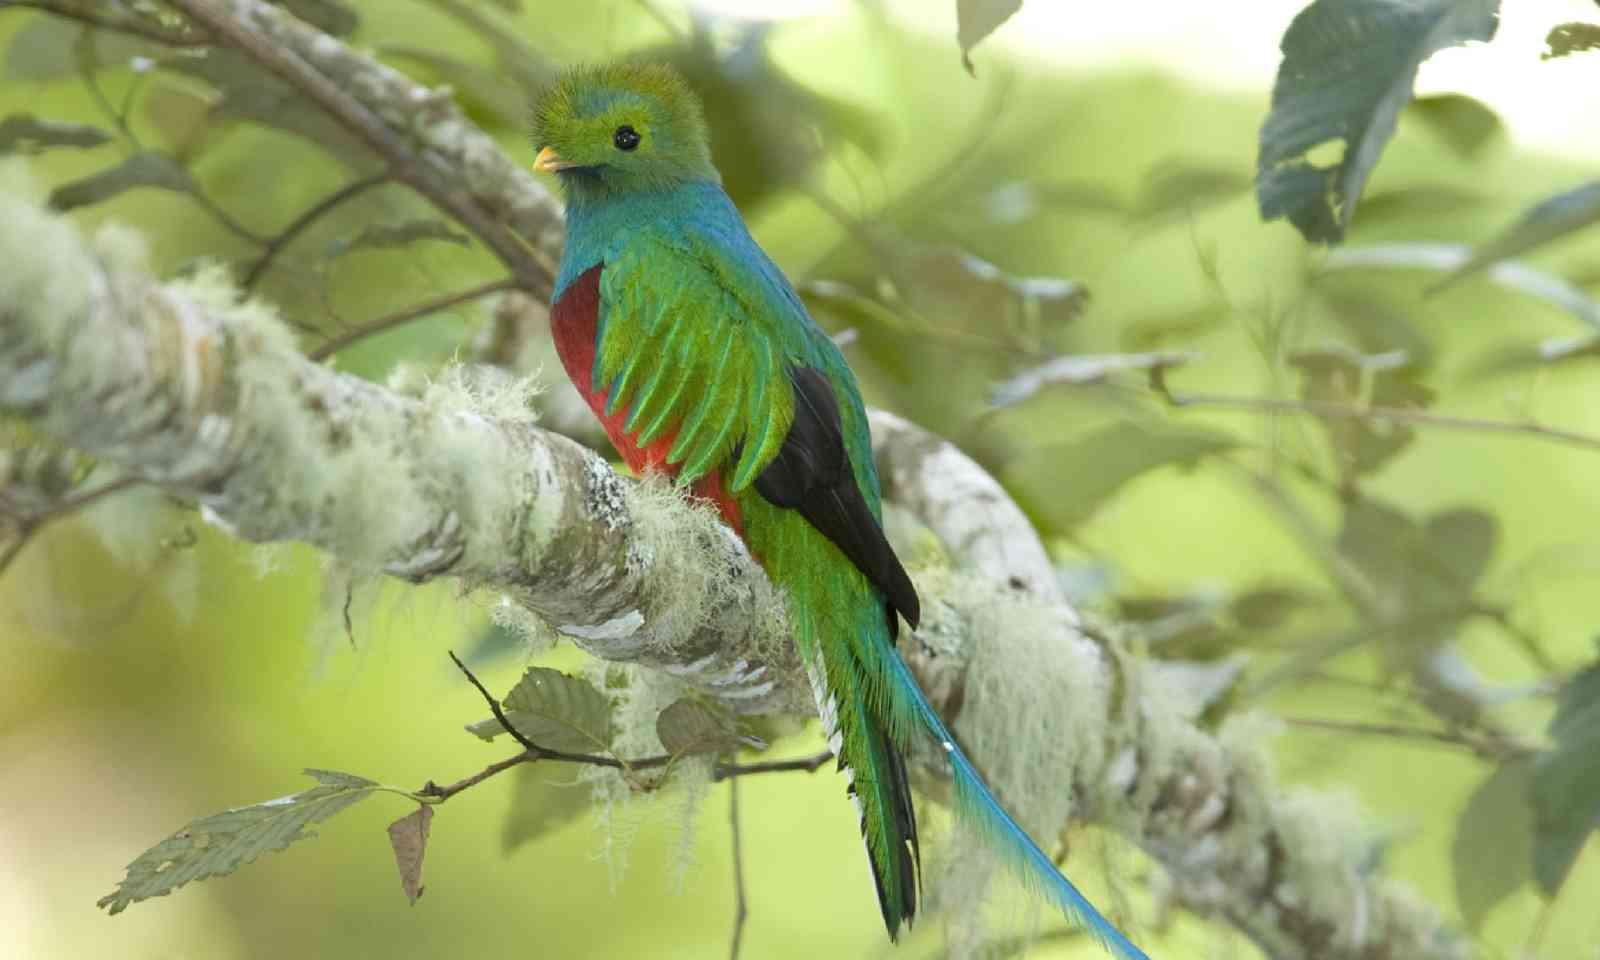 Queztal, Costa Rica (Shutterstock)